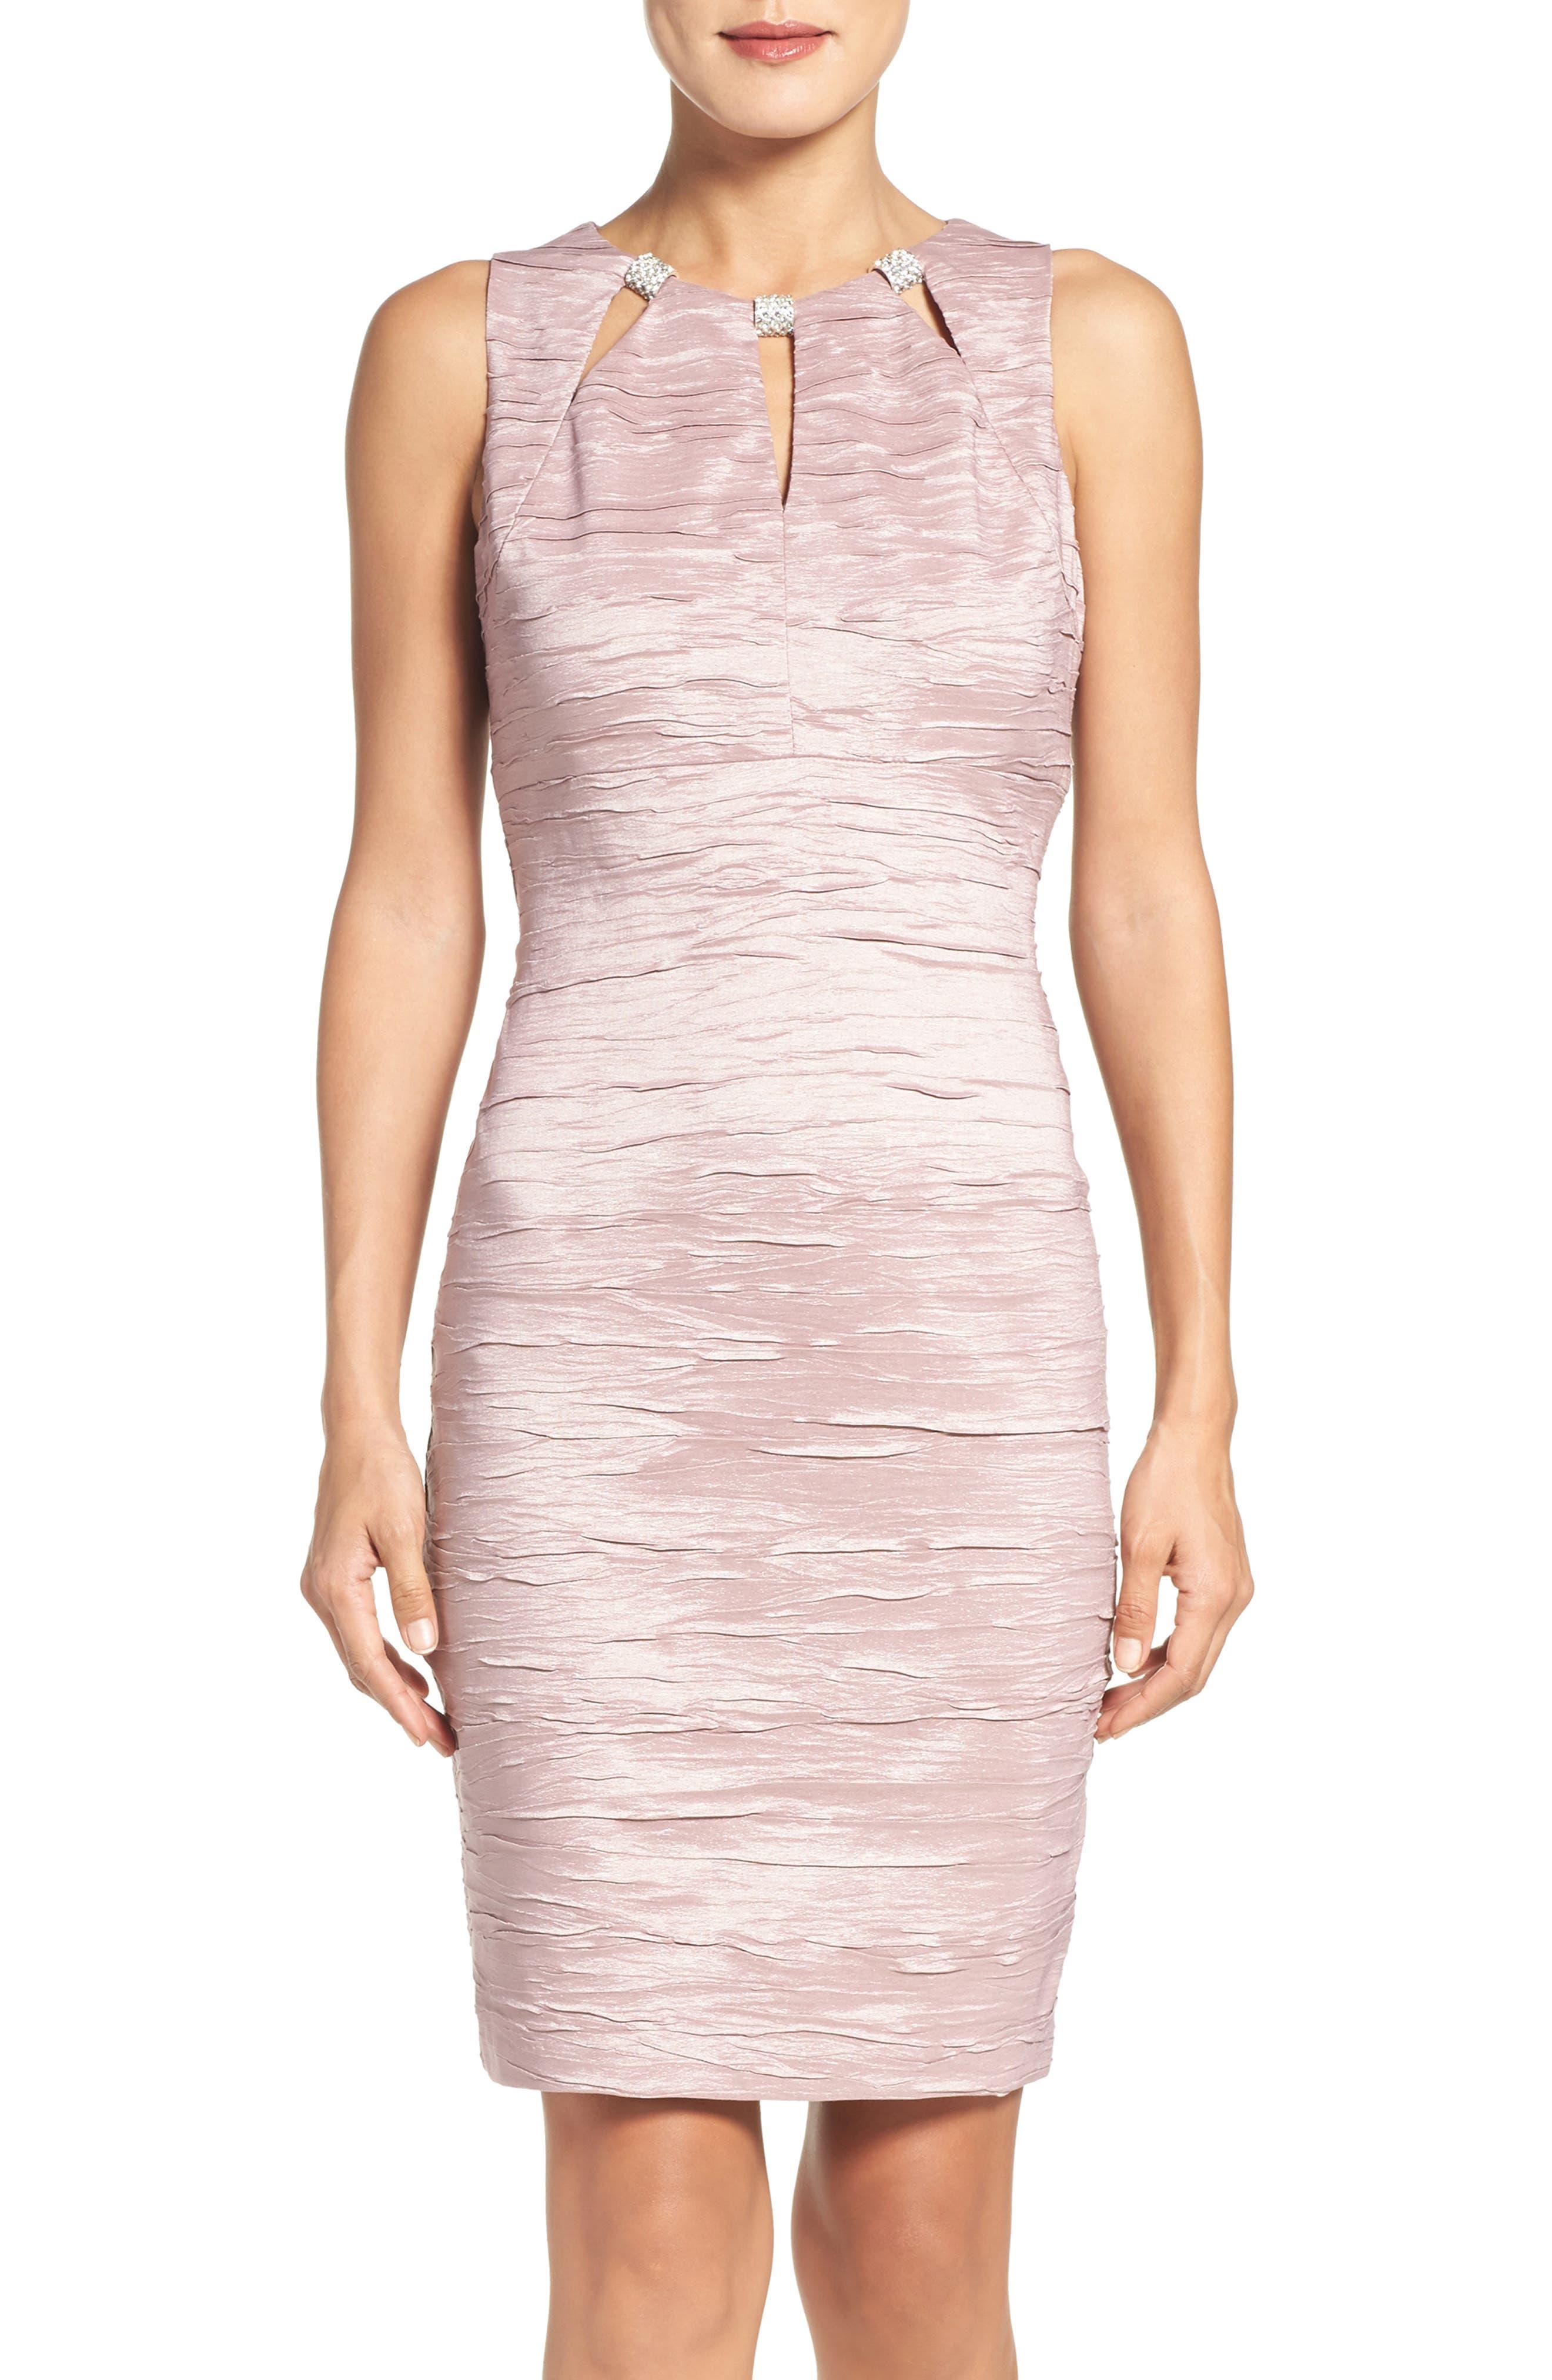 Embellished Cutout Taffeta Sheath Dress,                             Main thumbnail 1, color,                             Mauve